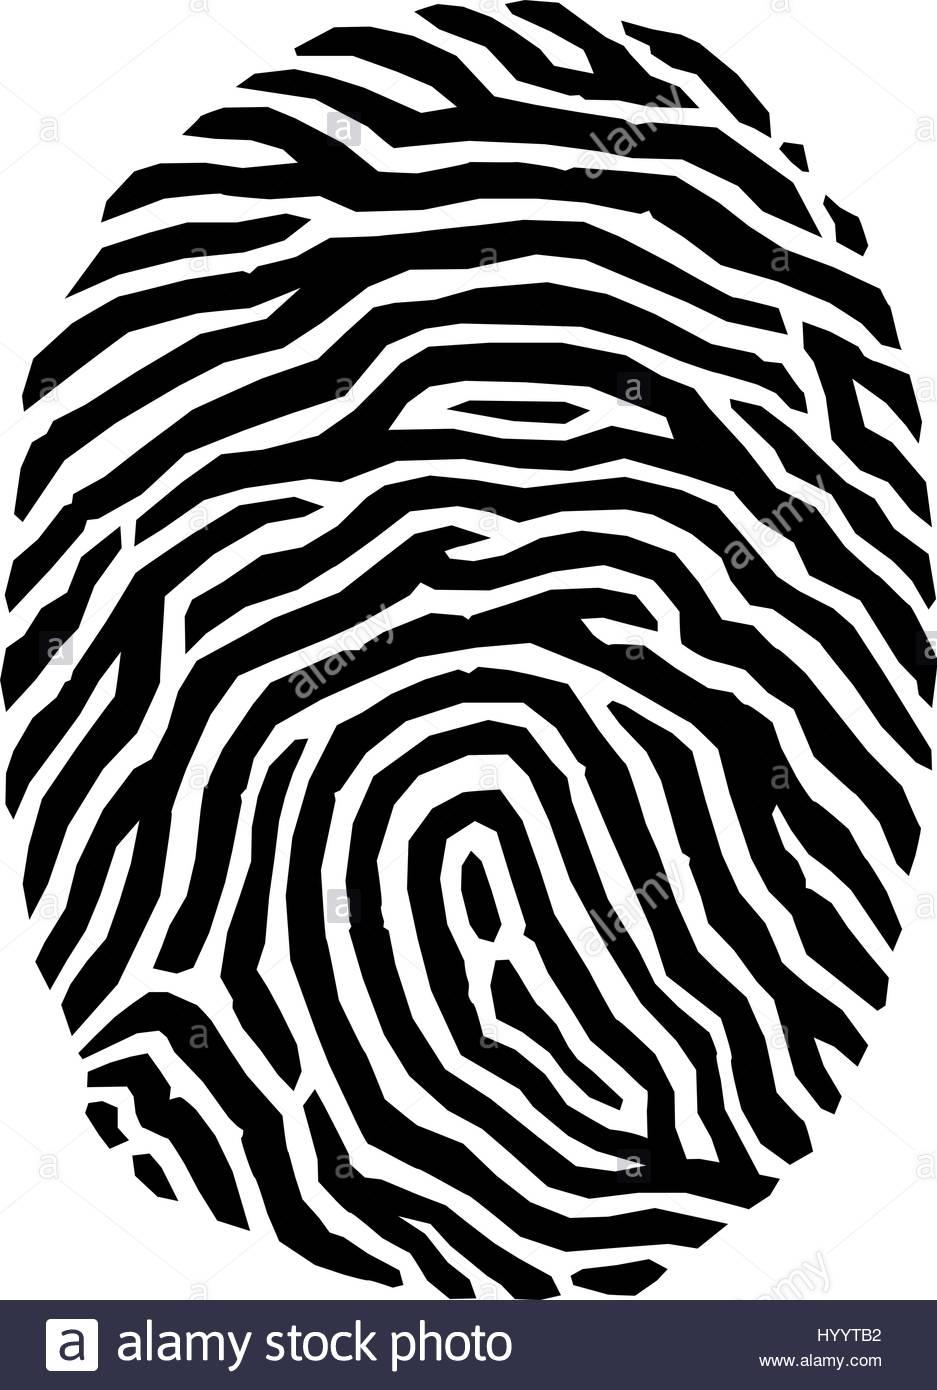 937x1390 Finger Print Vector Illustration Stock Vector Art Amp Illustration